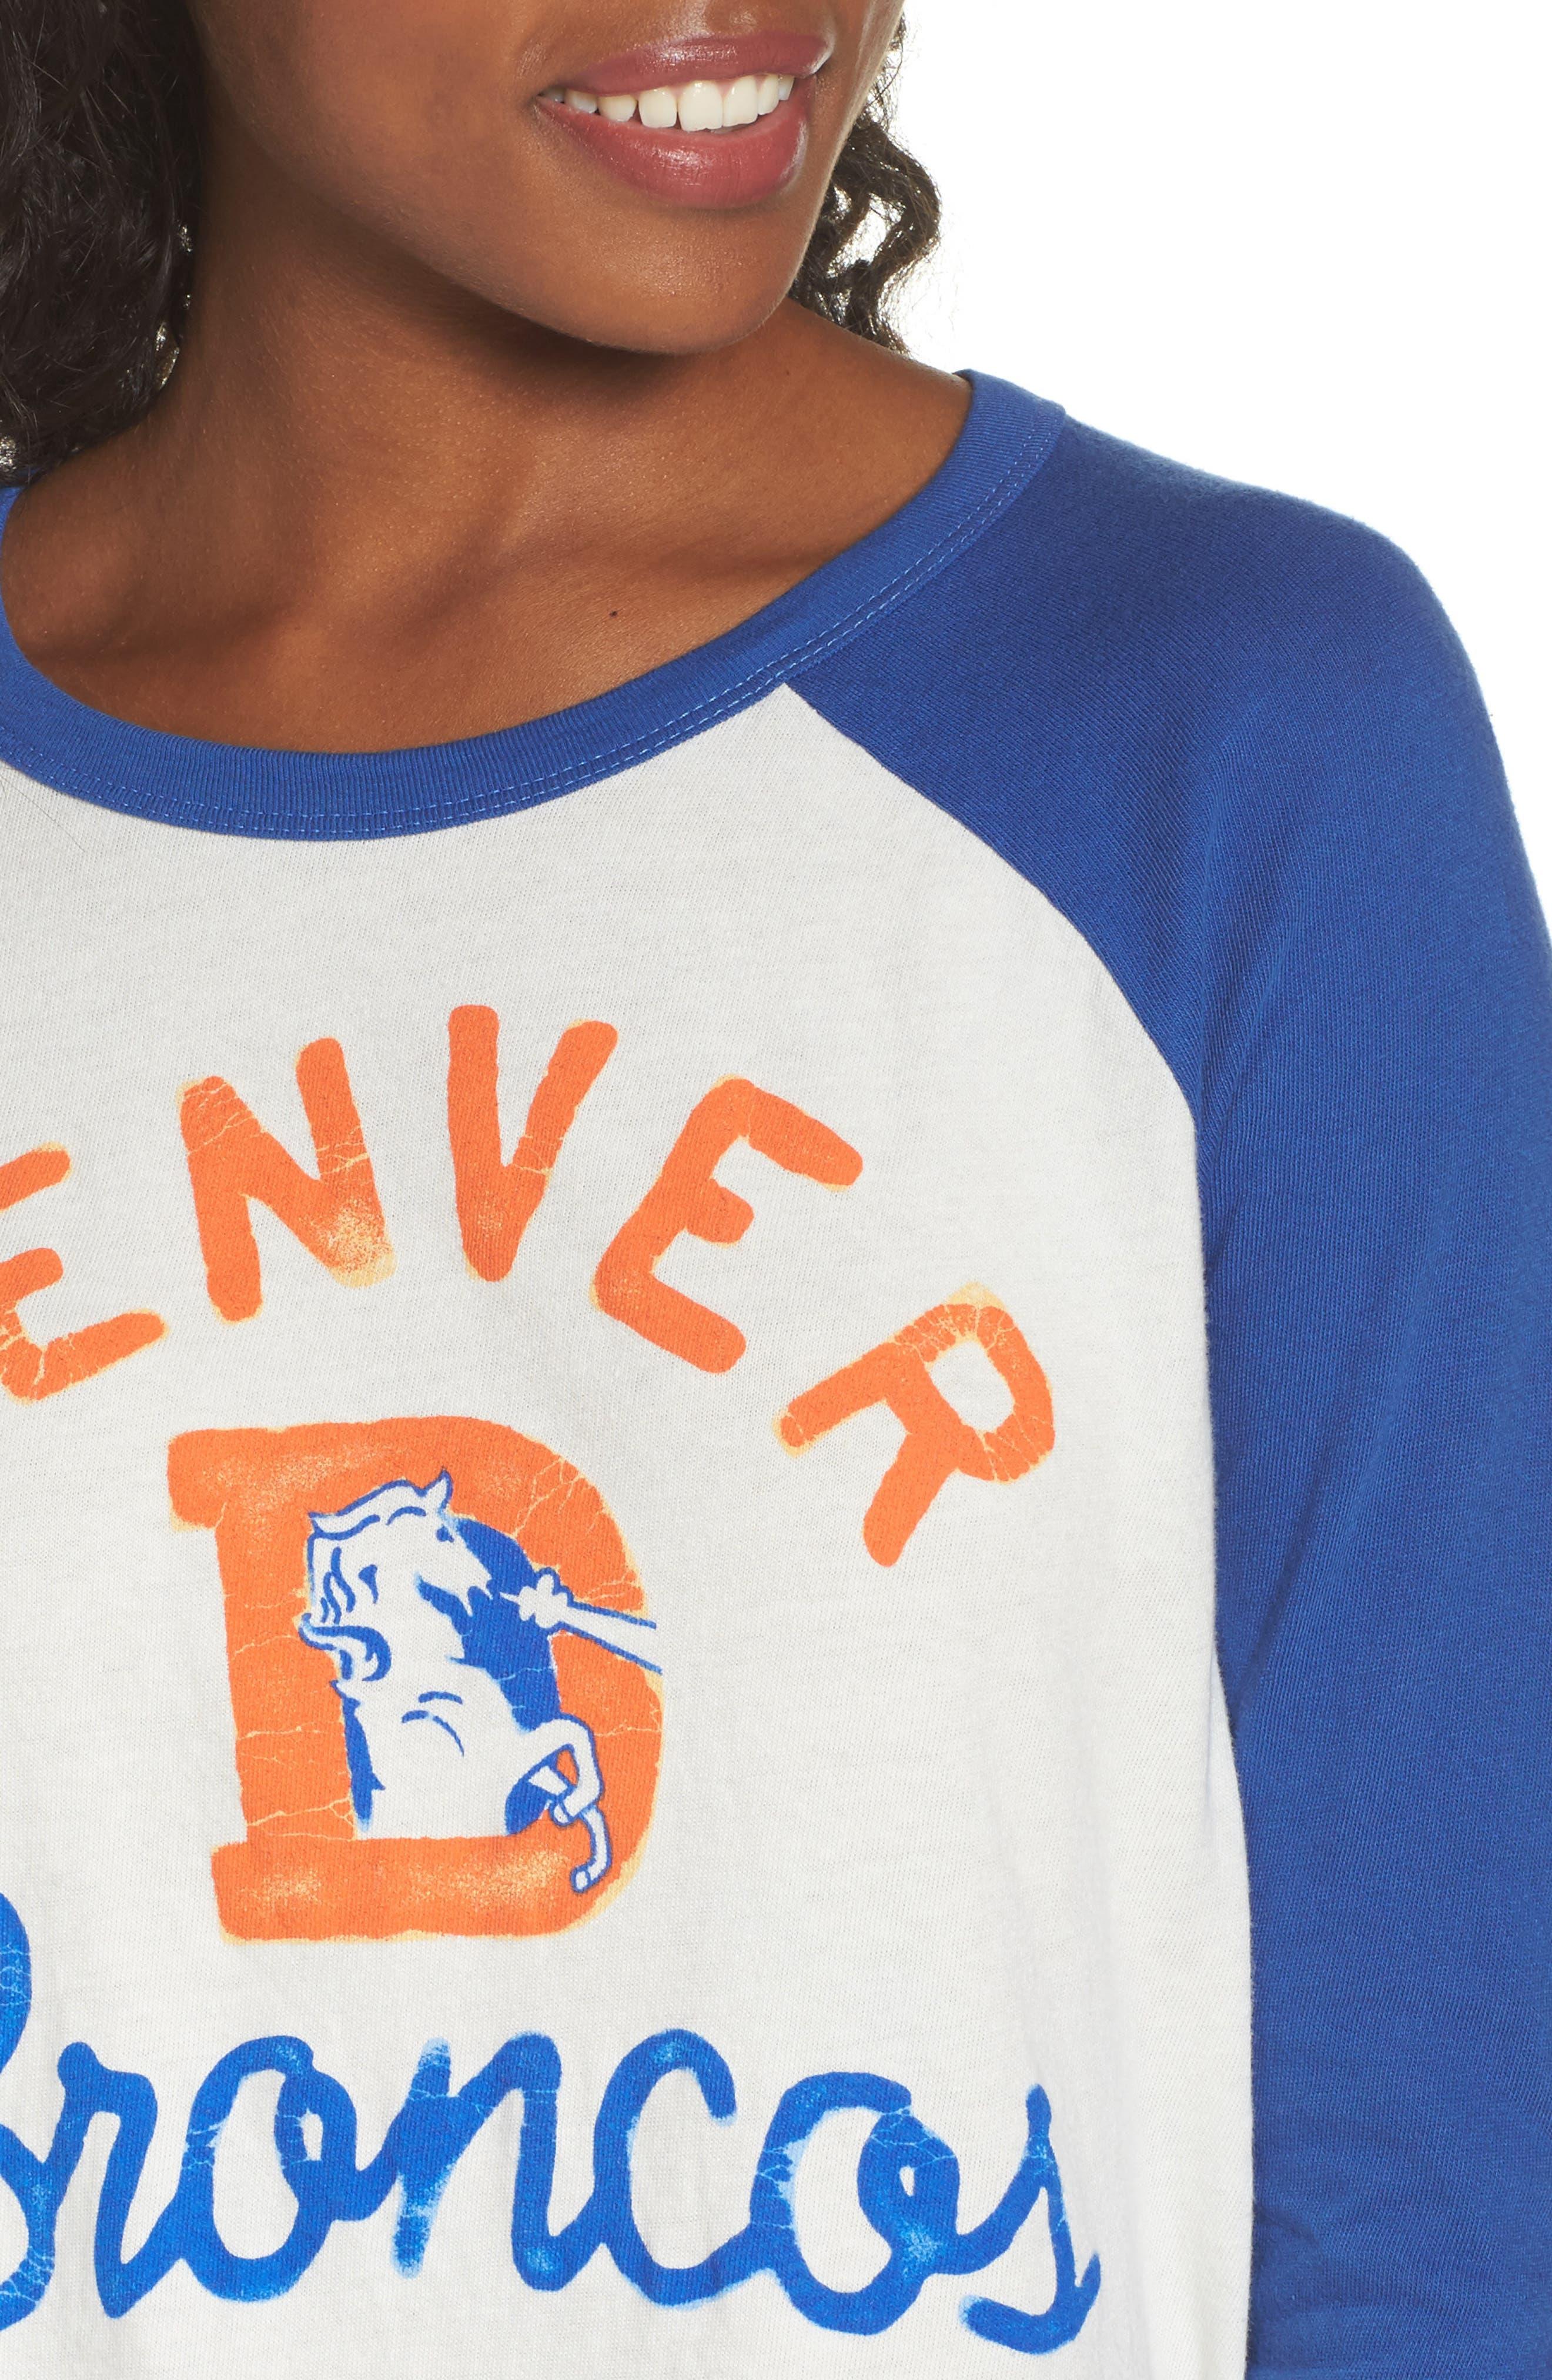 NFL Denver Broncos Raglan Tee,                             Alternate thumbnail 4, color,                             Sugar/ Liberty